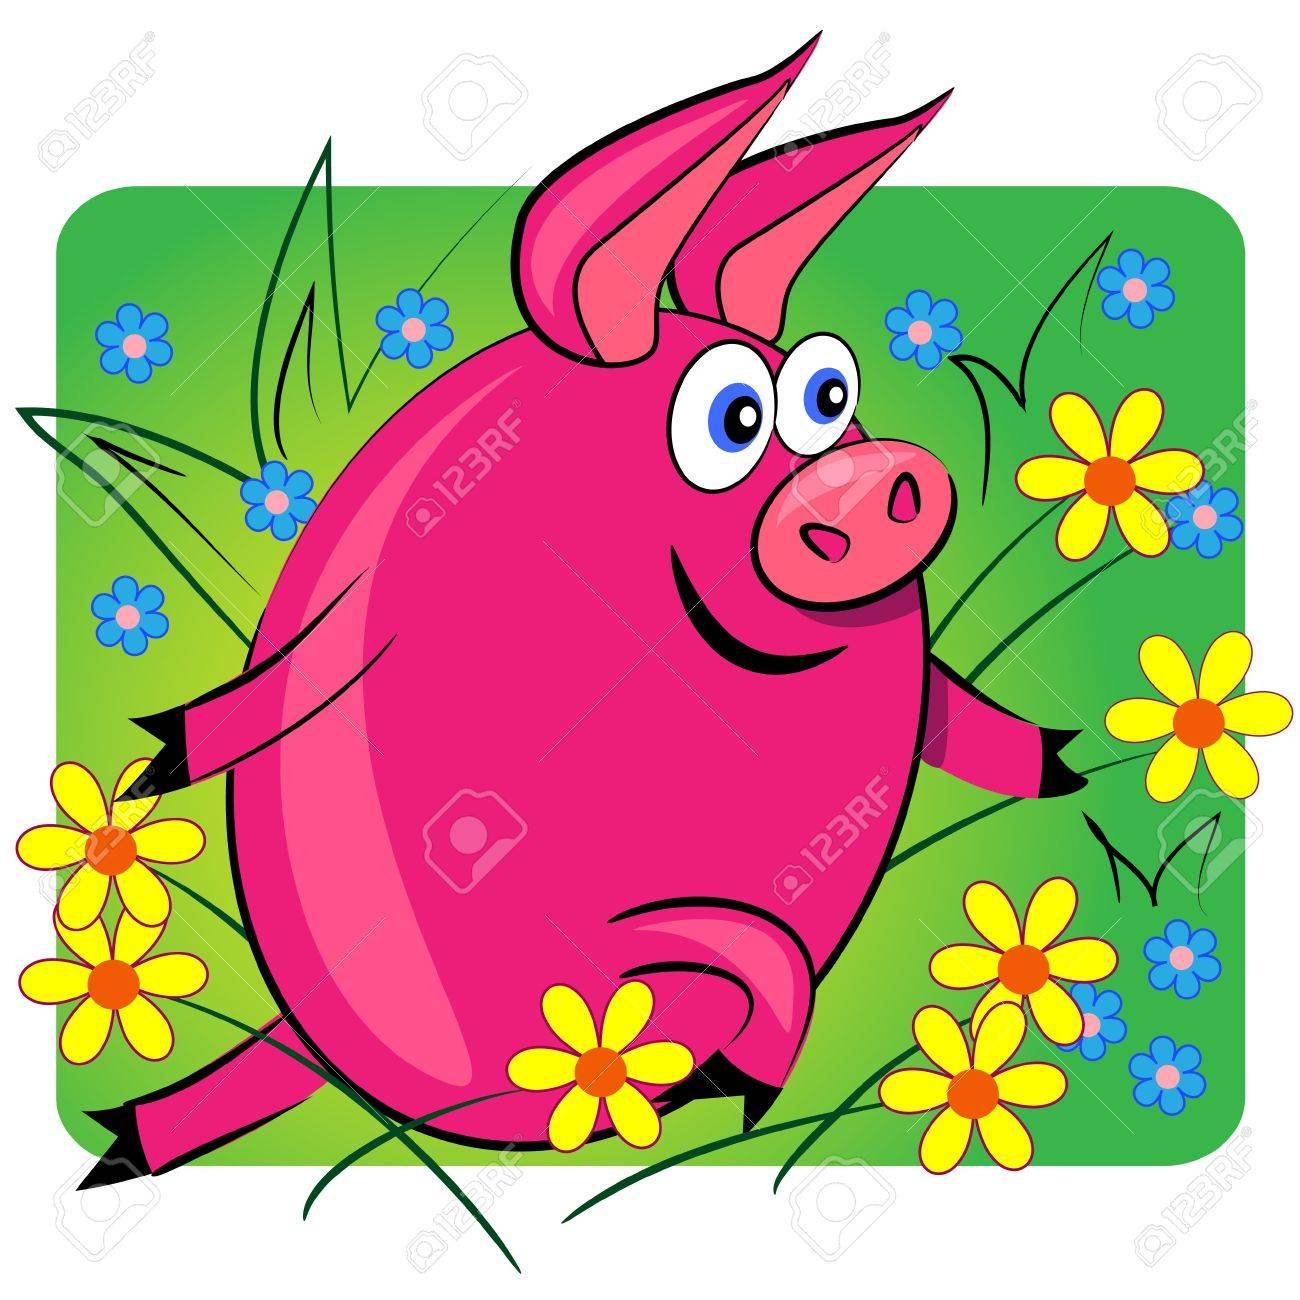 pig running on floral background.cartoon animal card.vector Stock Vector - 11411155